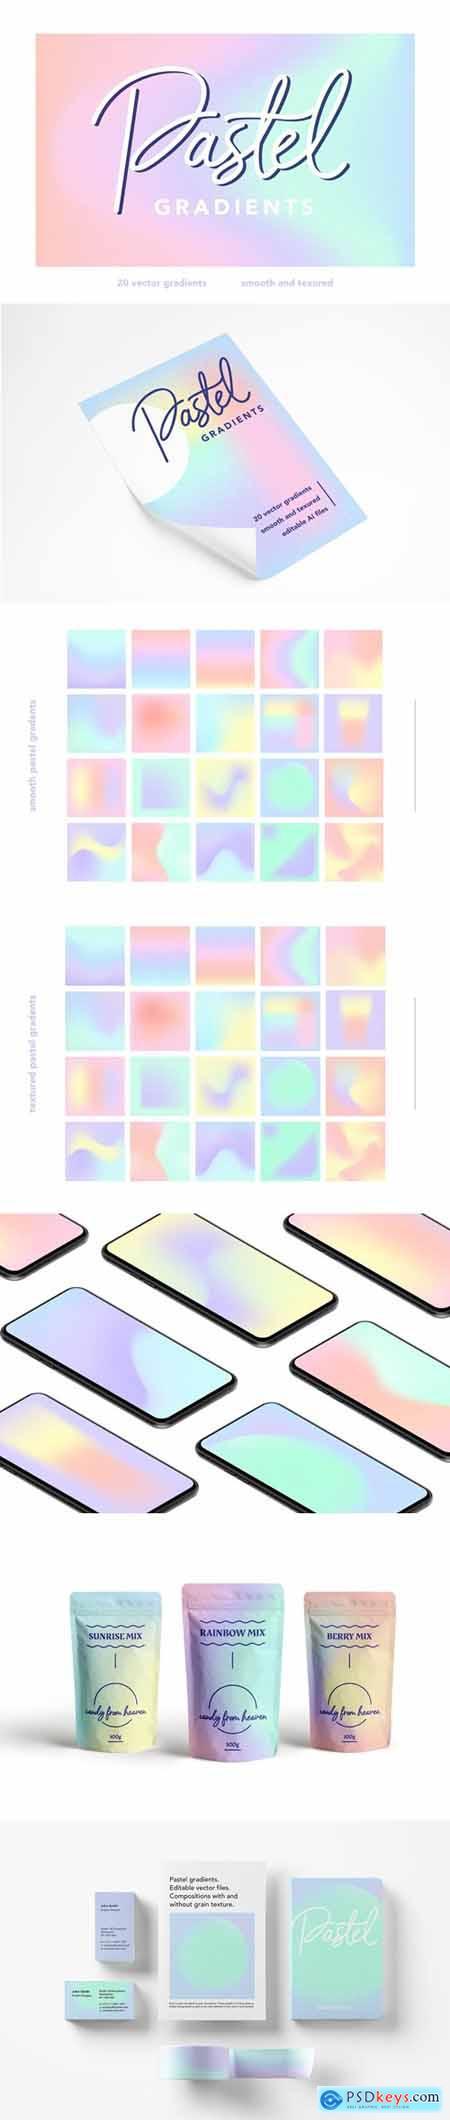 Pastel gradients